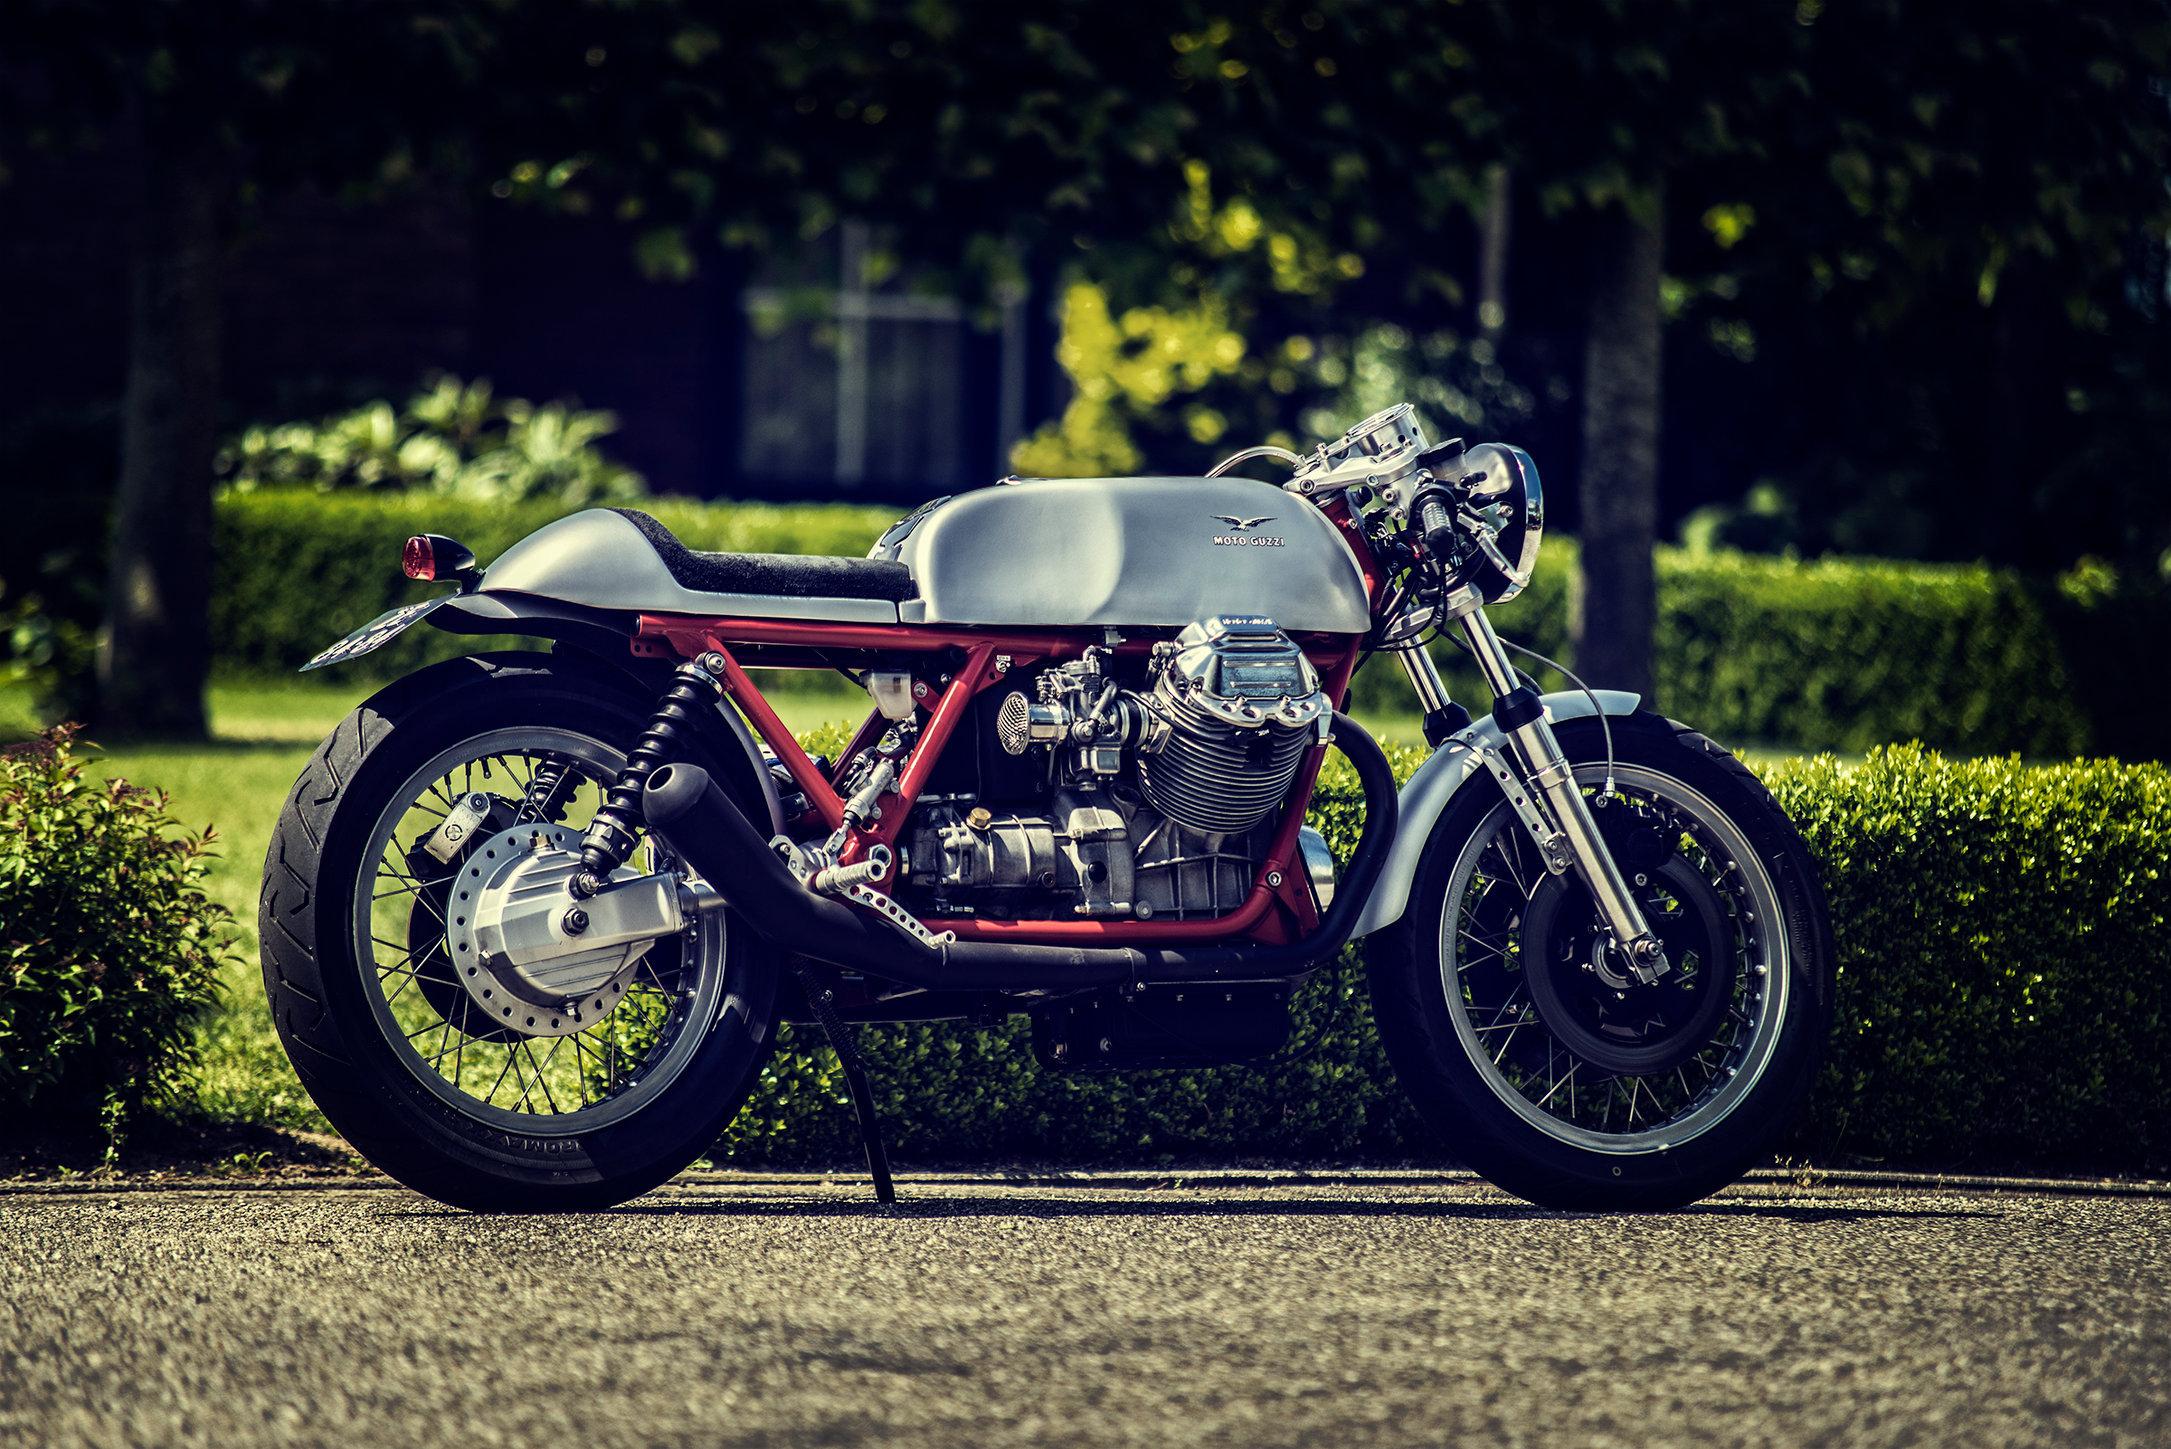 Moto Guzzi Le Mans | Size 60x40cm aluminium